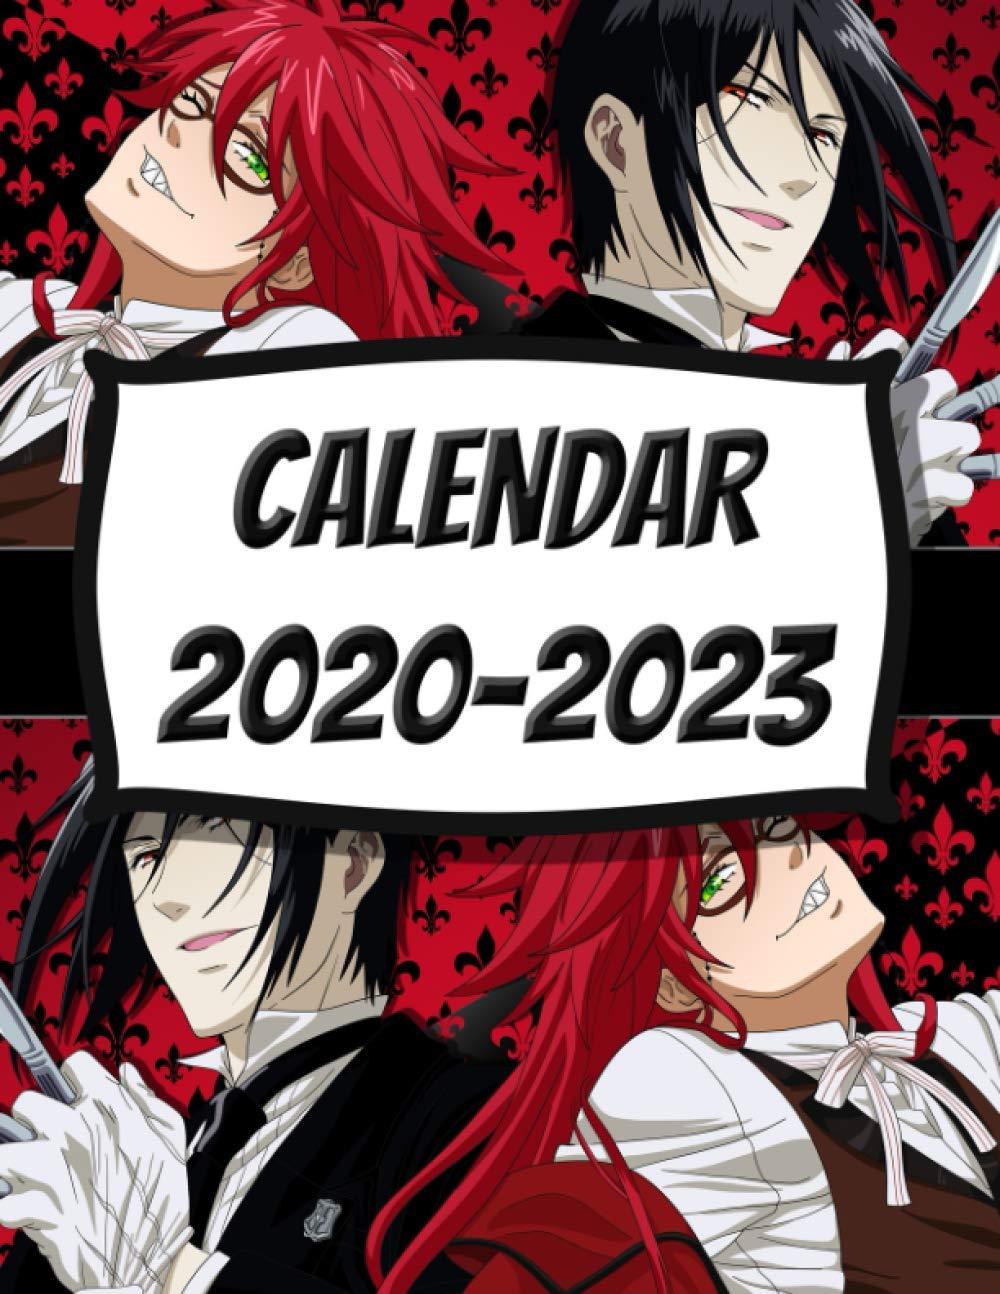 Limited Edition Sebastian Michaelis Grell Sutcliff Black Butler Anime Manga Series Fan S Calendar 2020 2023 Ayano Yoshimoto 9798686181540 Amazon Com Books